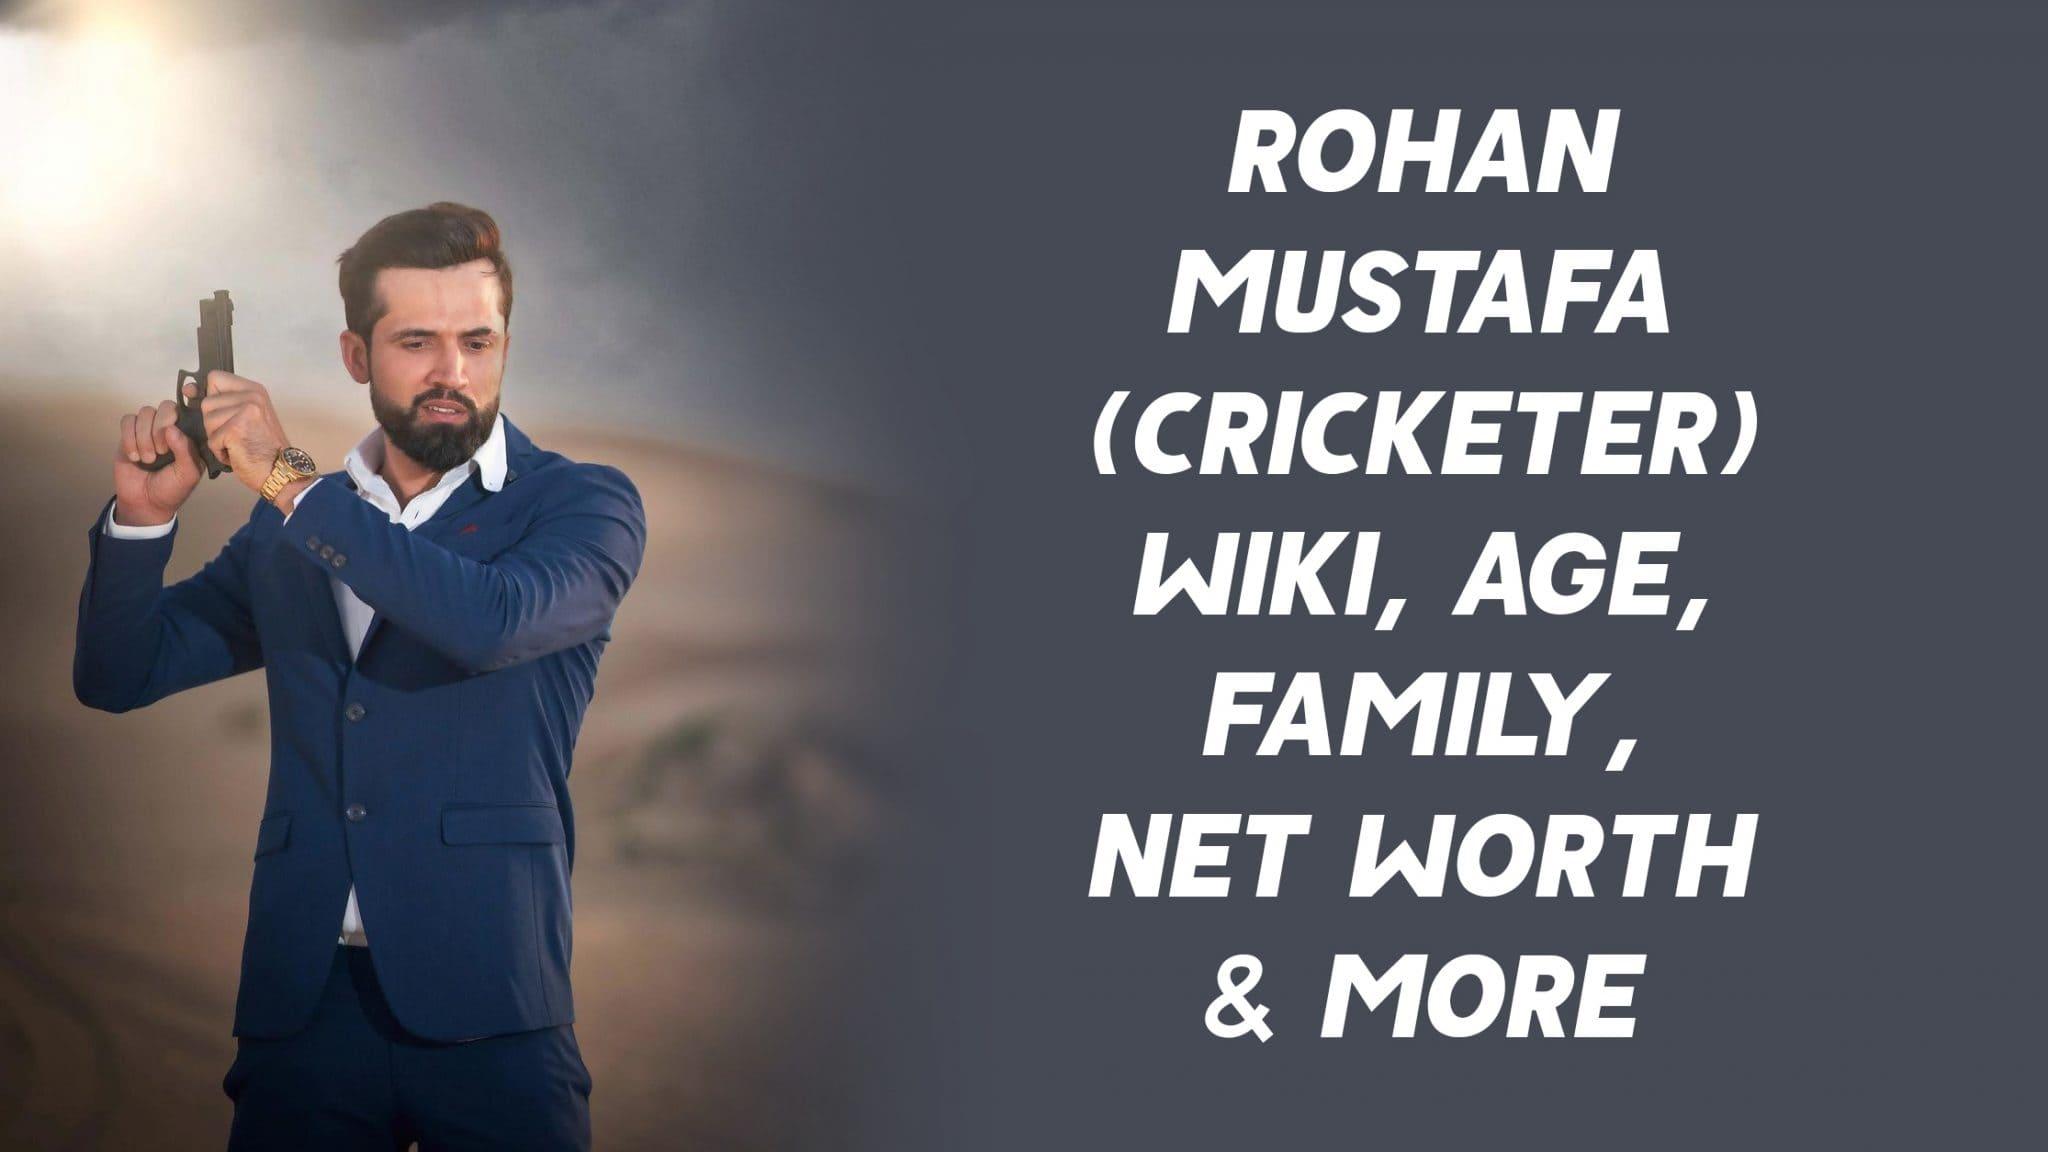 Rohan Mustafa (Cricketer) Wiki, Age, Family, Net Worth & More 1